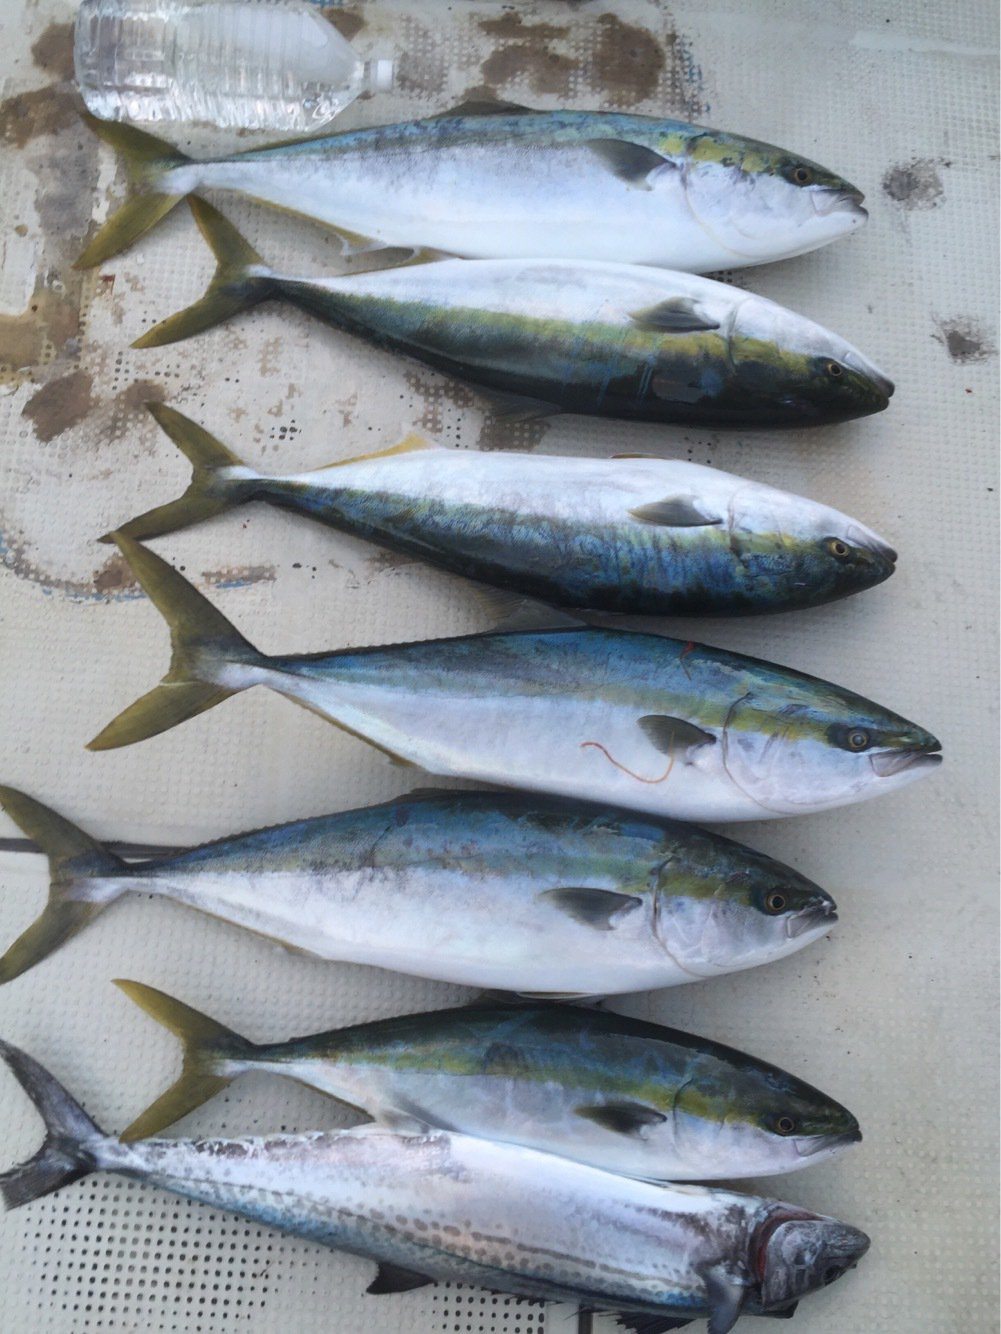 Freemanyoshikiさんの投稿画像,写っている魚はブリ